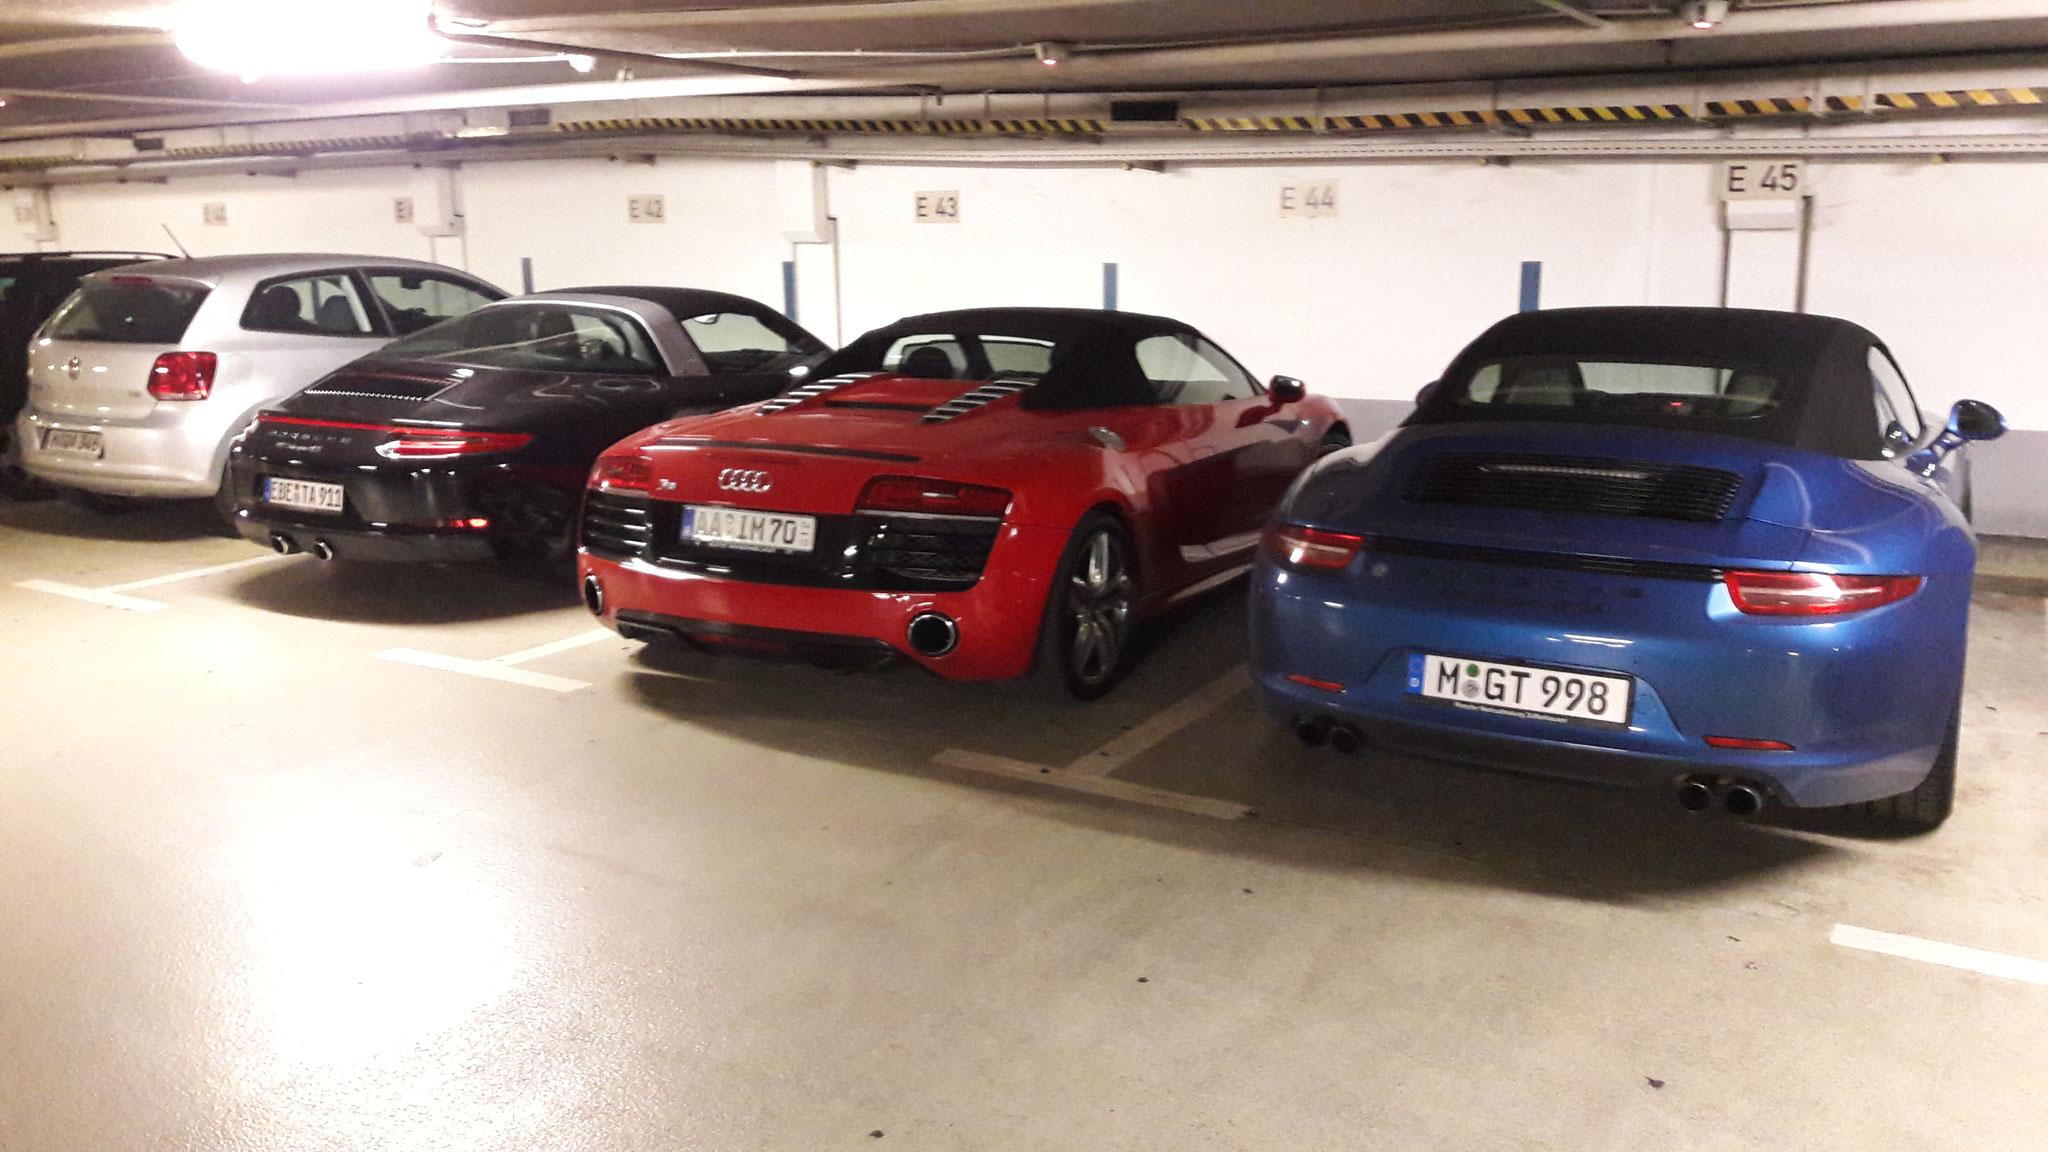 Audi R8 V10 Spyder - AA-IM-70